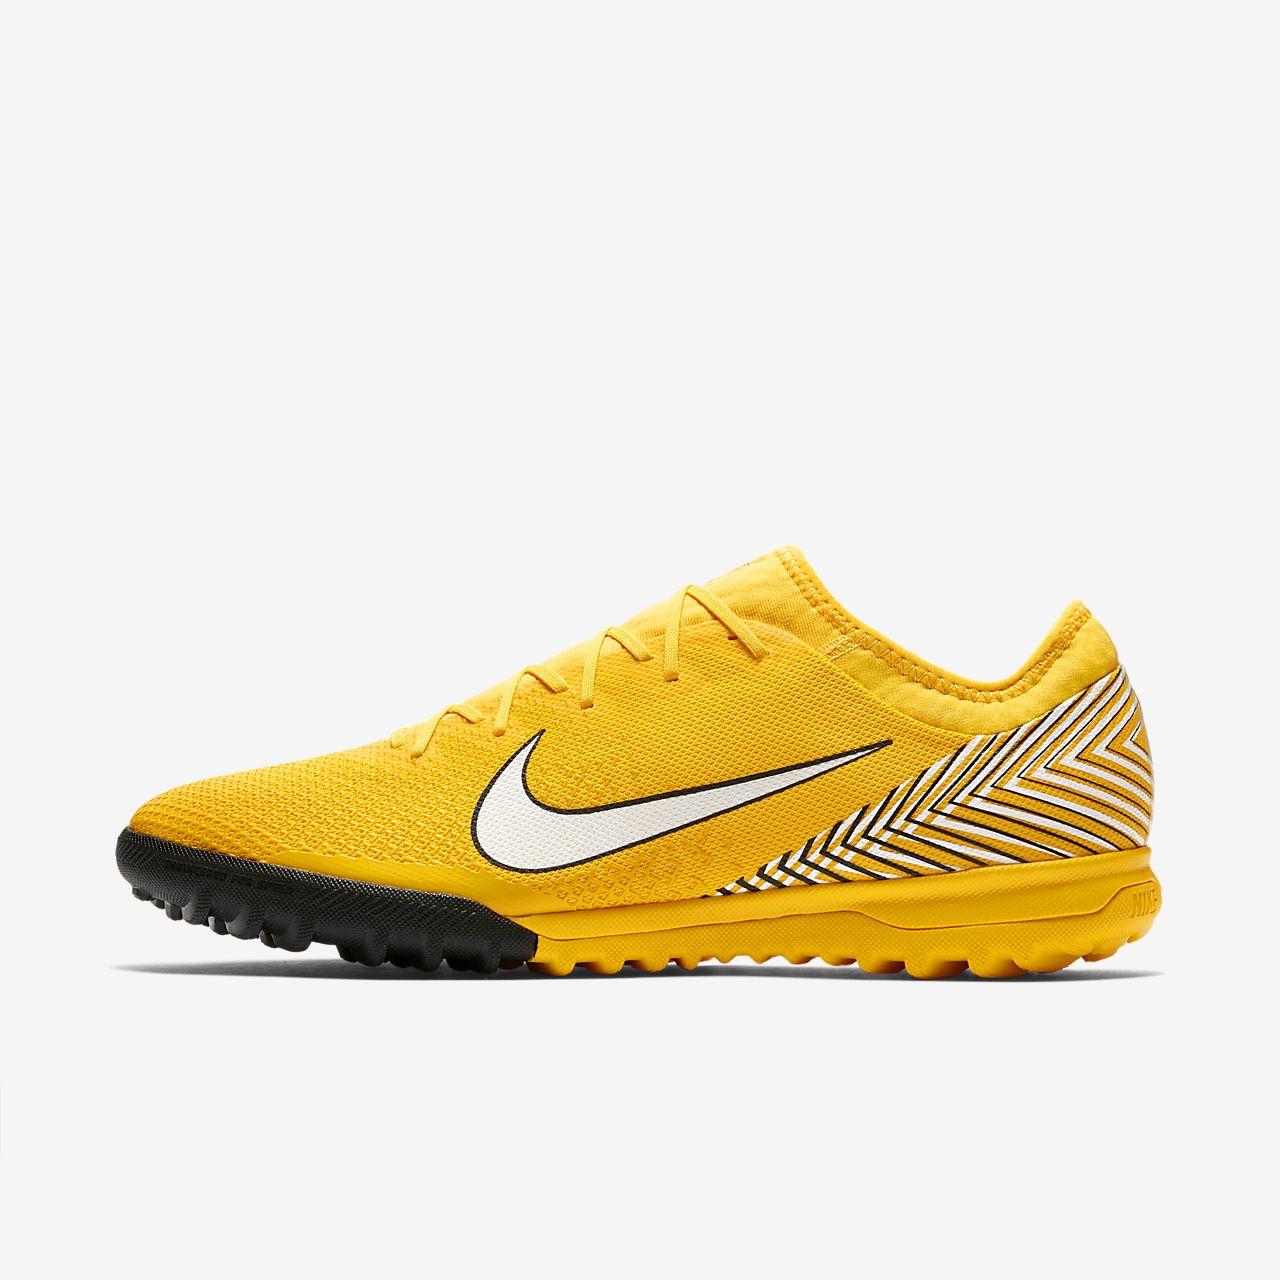 4aad8eb10537 ... switzerland nike mercurial vapor xii pro neymar jr. artificial turf  football shoe f06b4 a2024